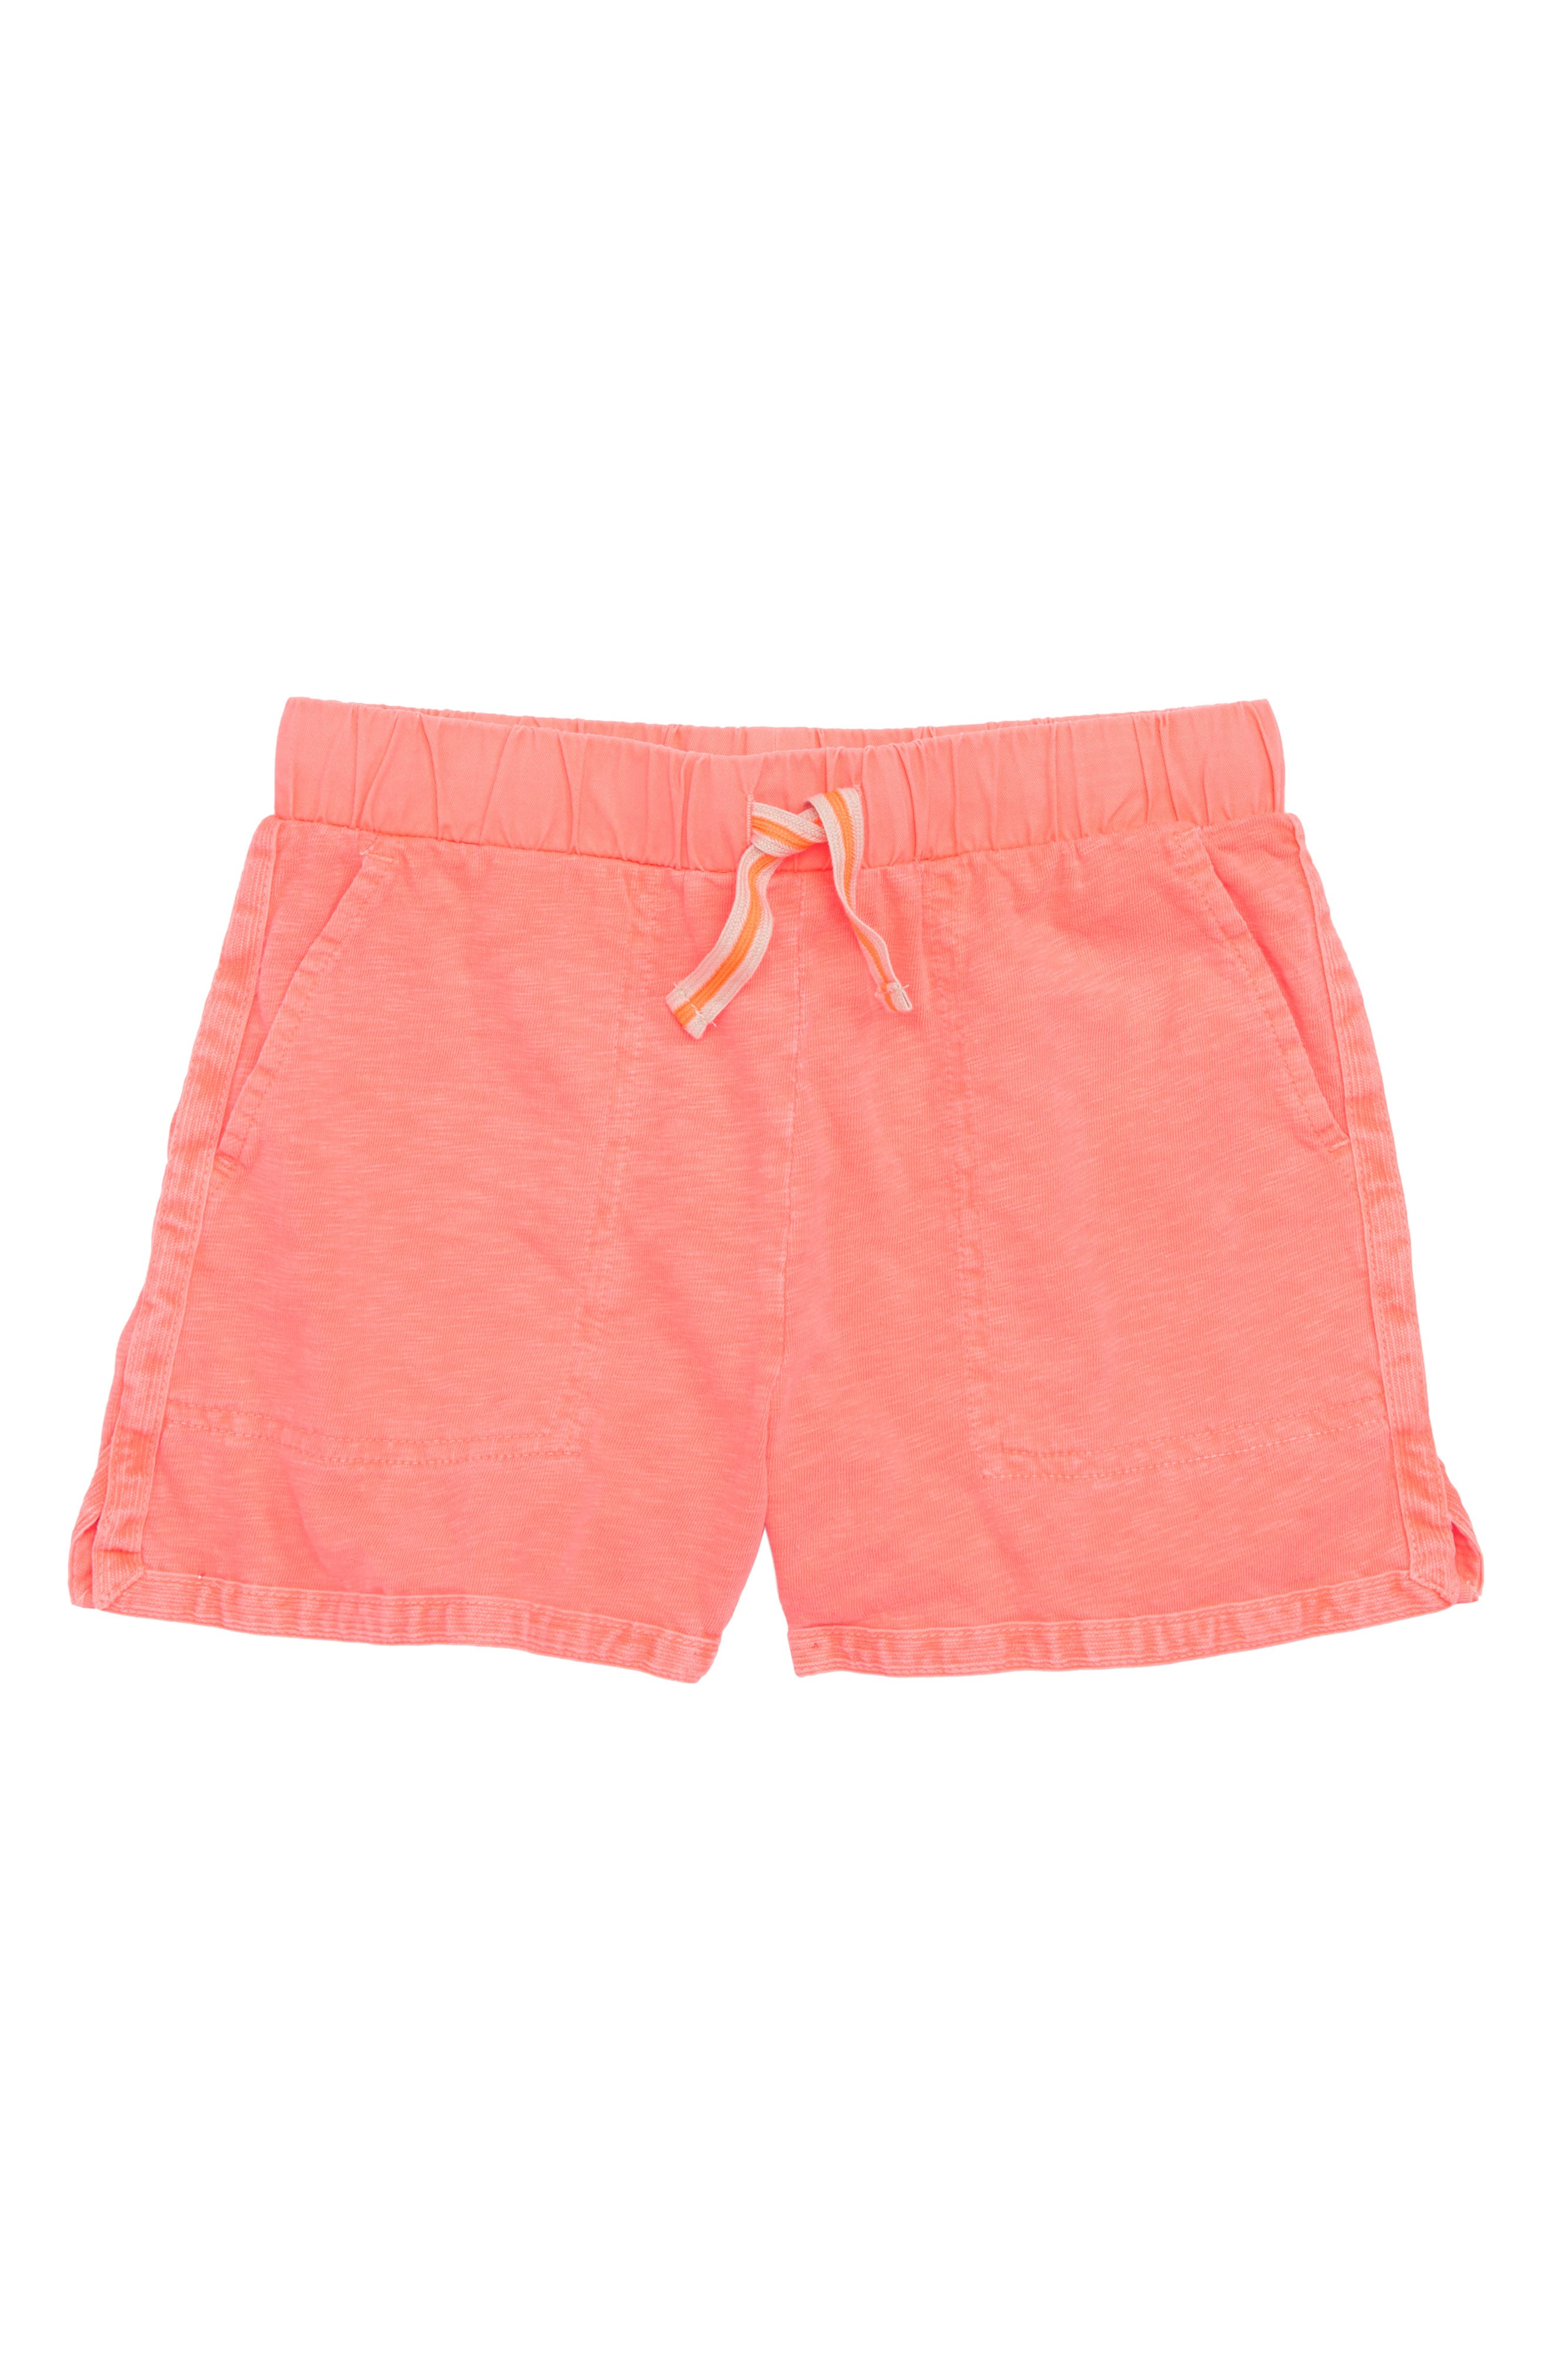 crewcuts by J.Crew Ester Cotton Shorts (Toddler Girls, Little Girls & Big Girls)